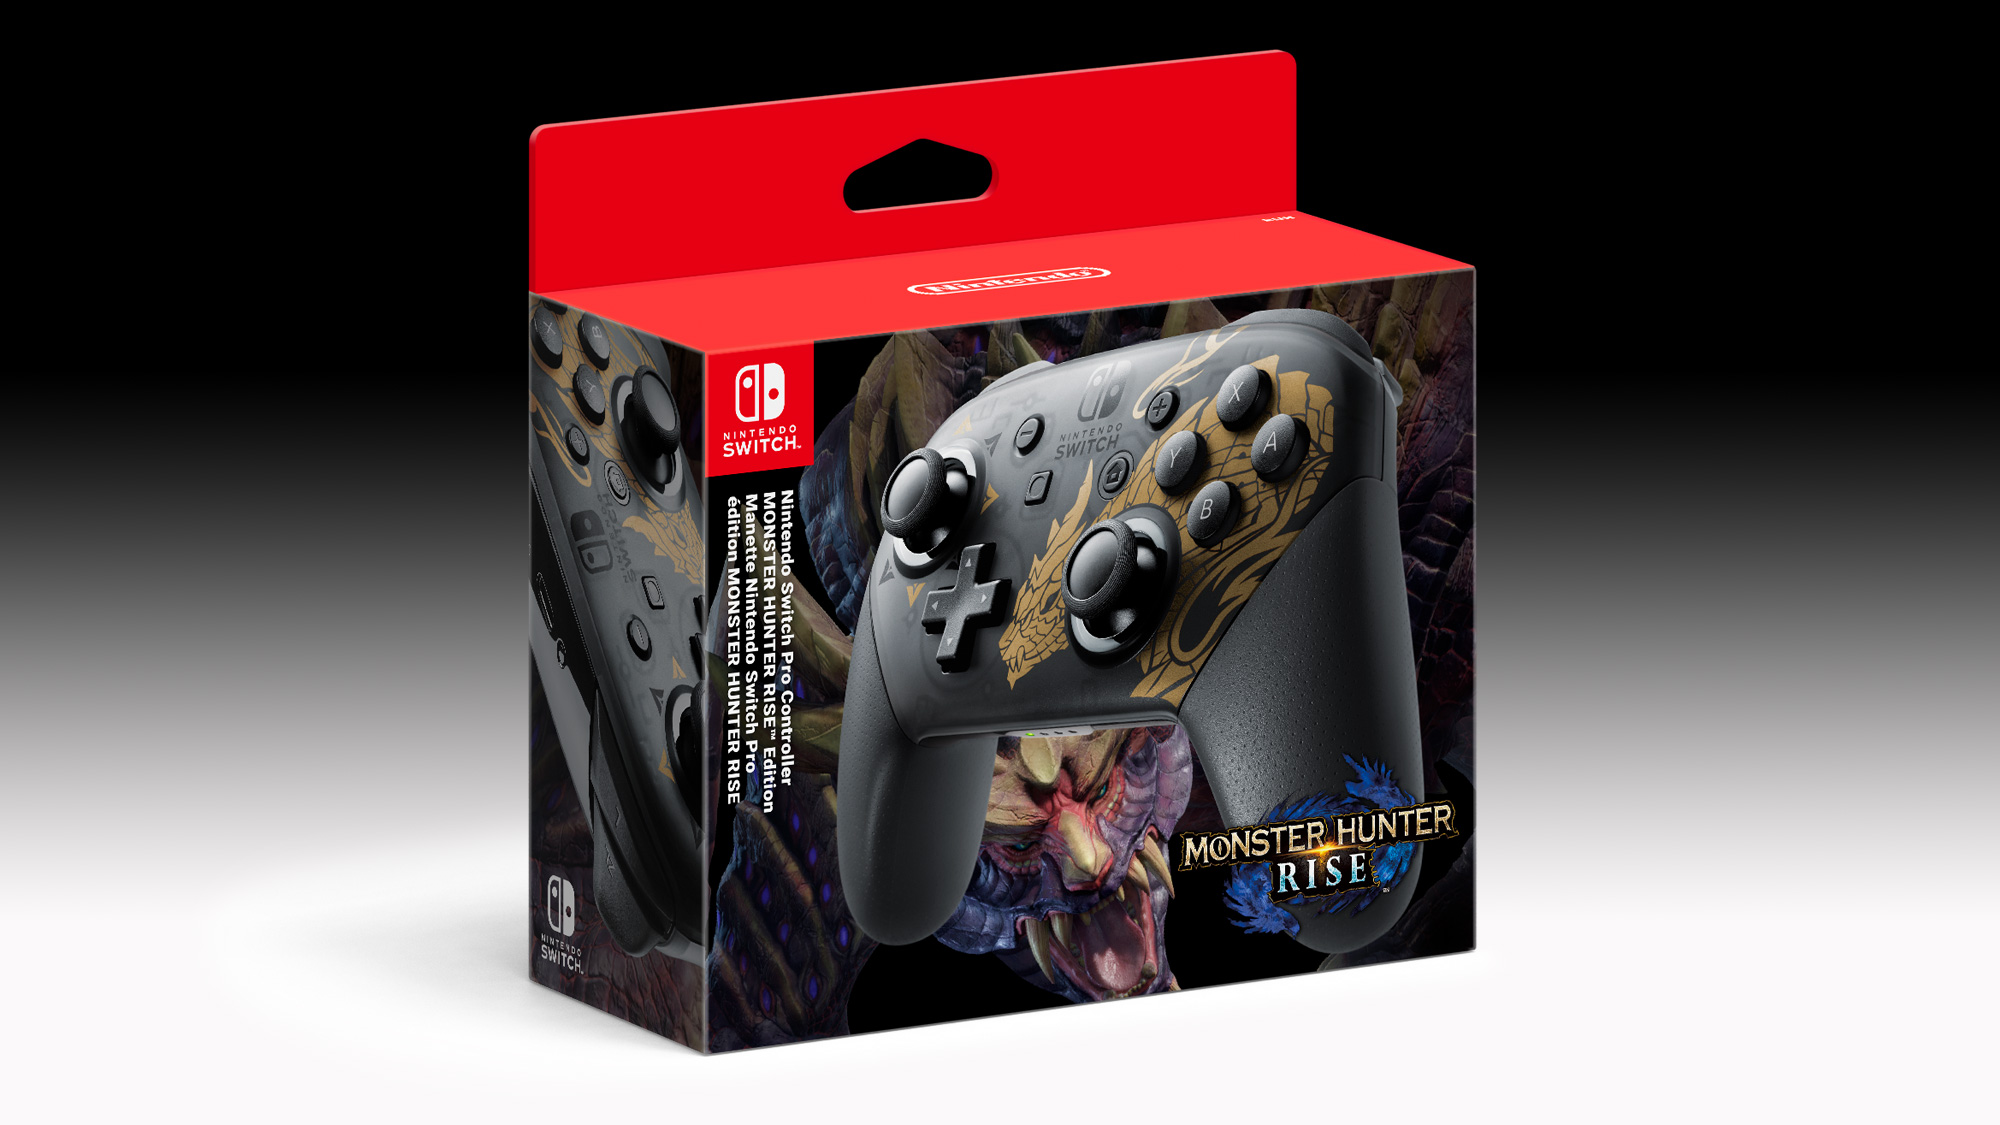 Nintendo Switch Monter Hunter Rise Pro controller ohjain